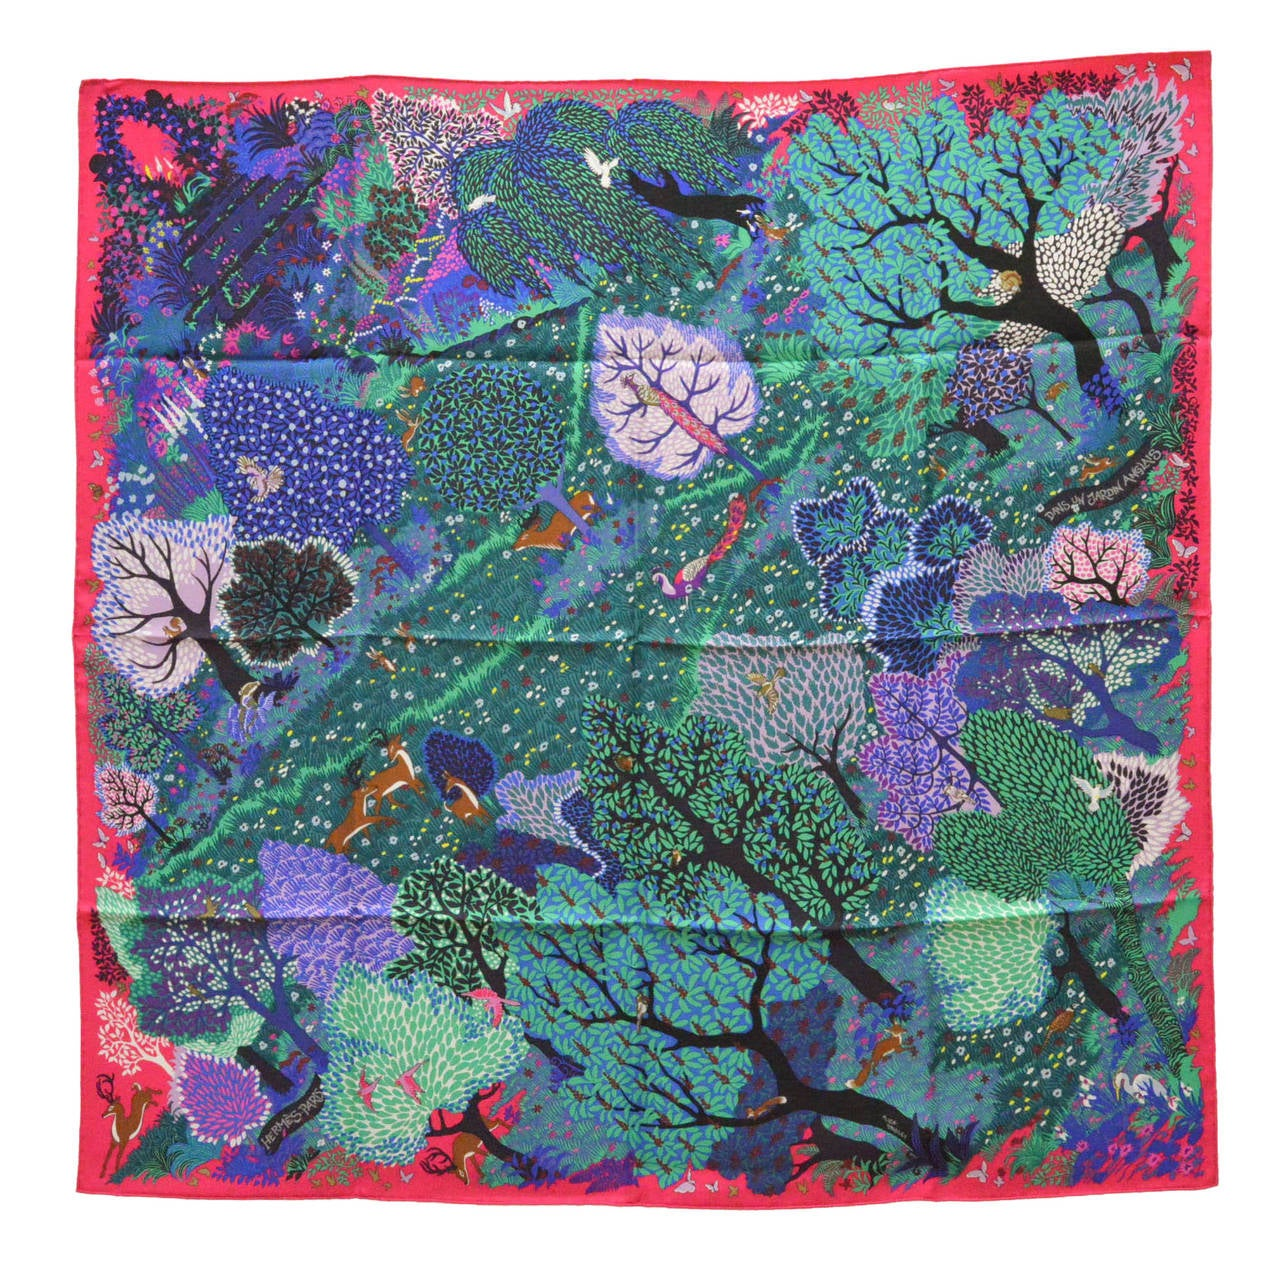 Hermes carre twill dans un jardin anglais silk bright pink for Dans un jardin anglais hermes